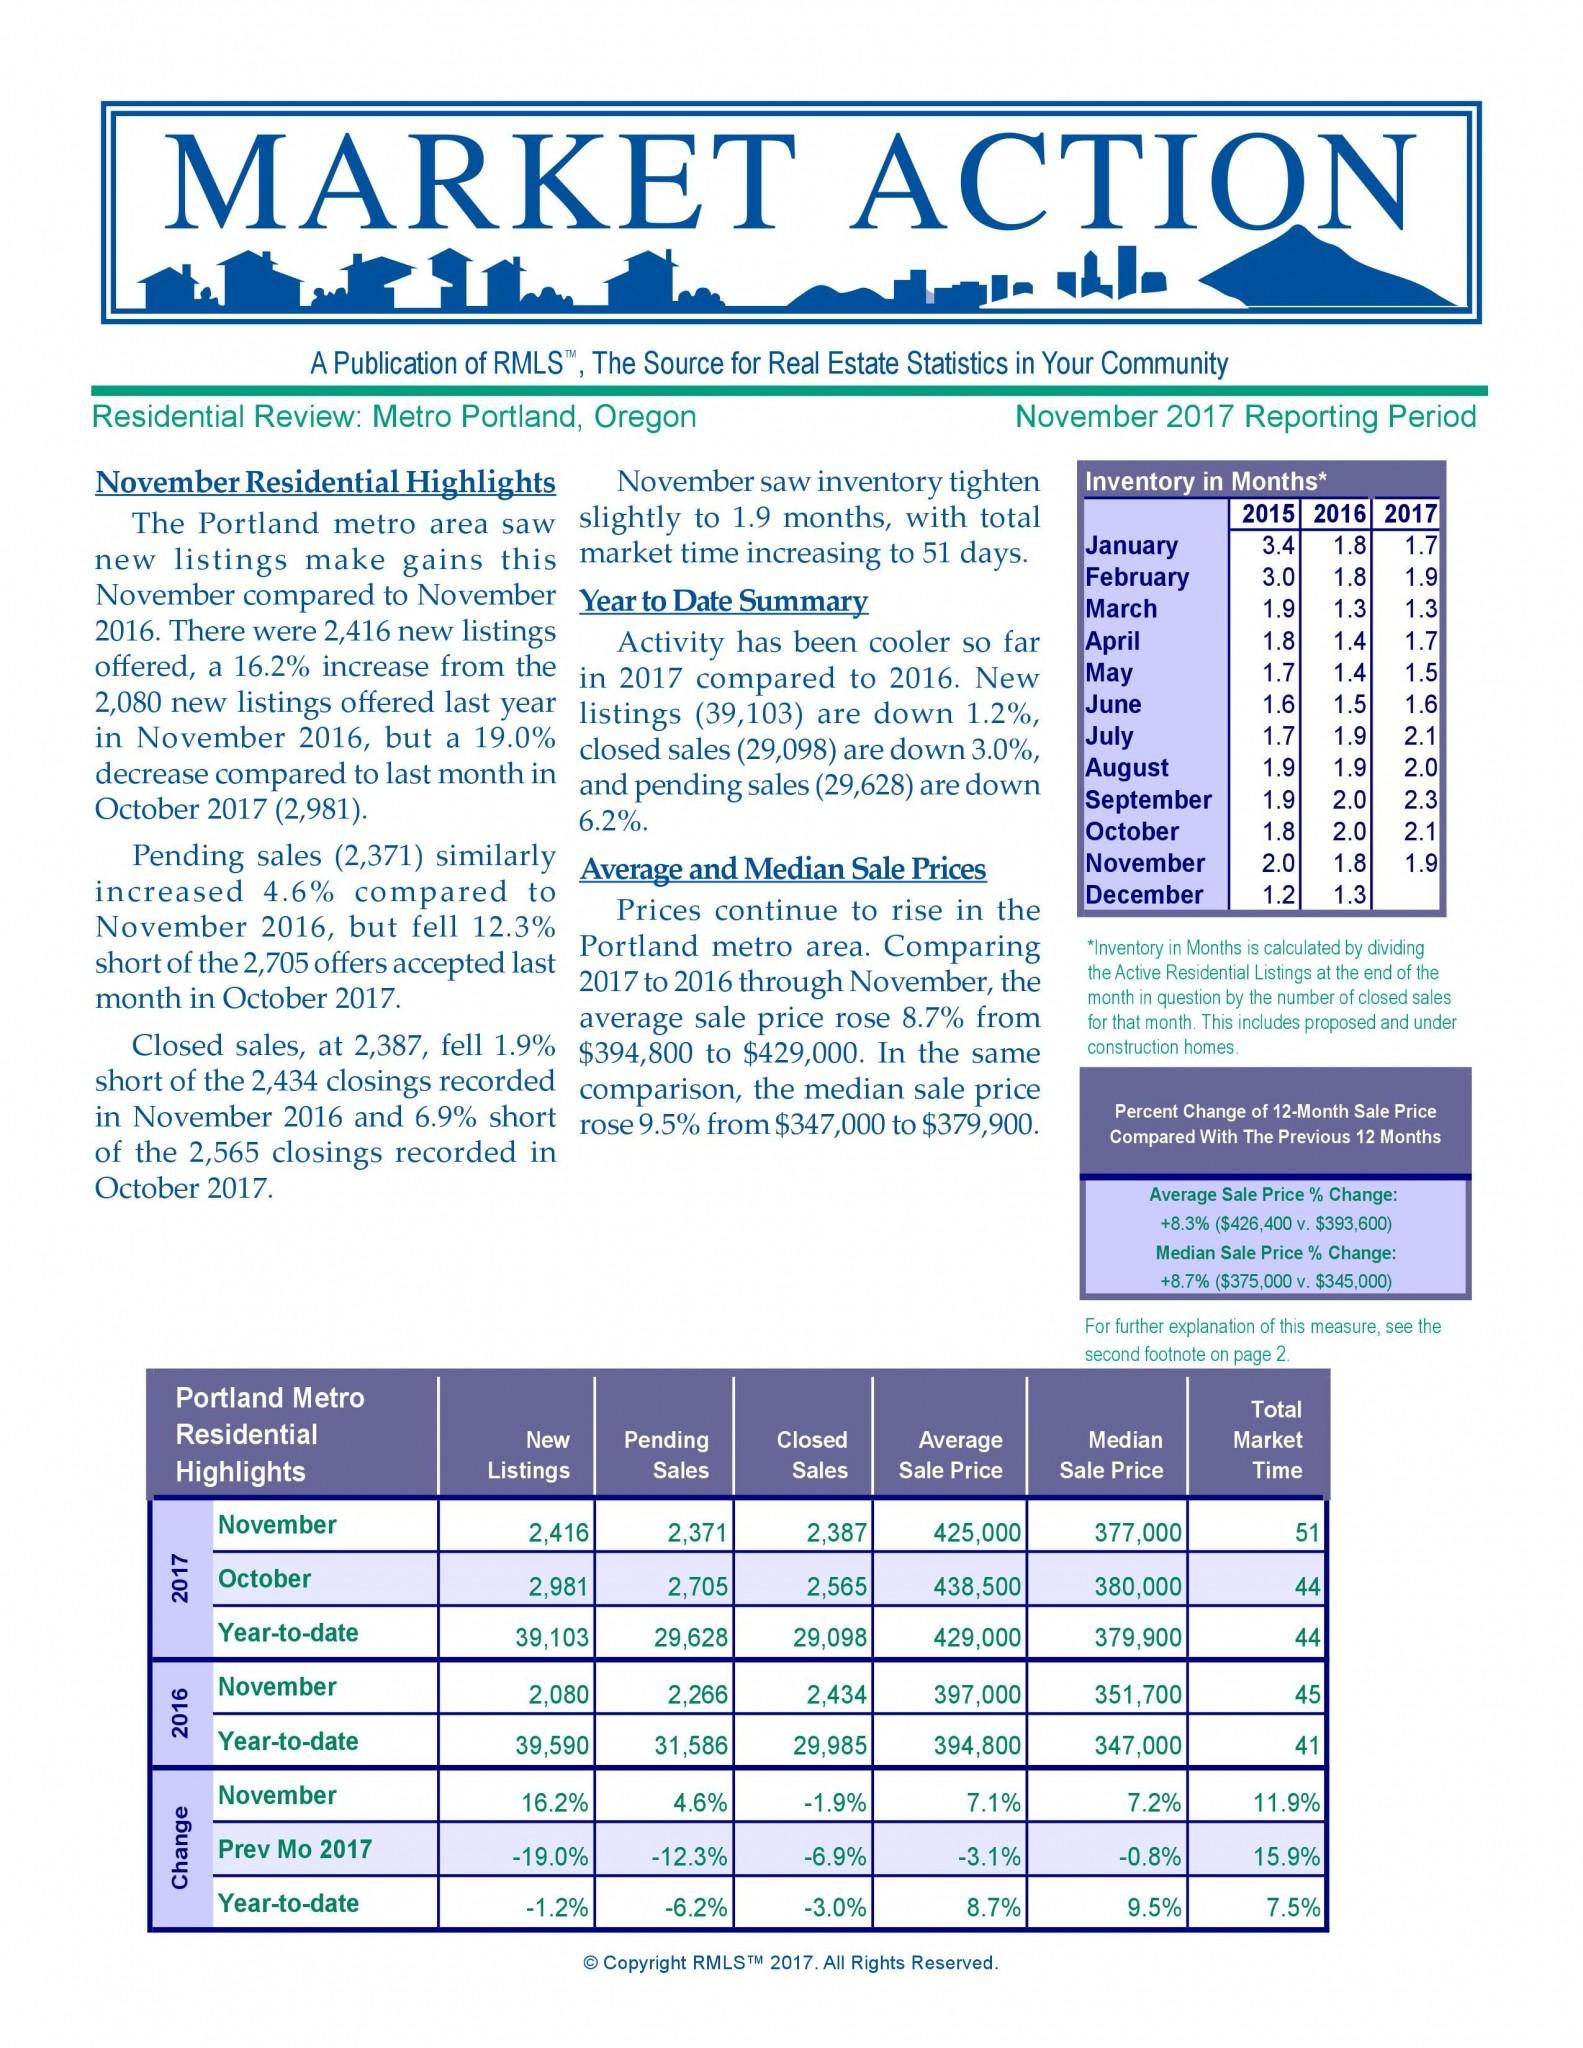 Portland Real Estate Metro Market Action Report November 2017